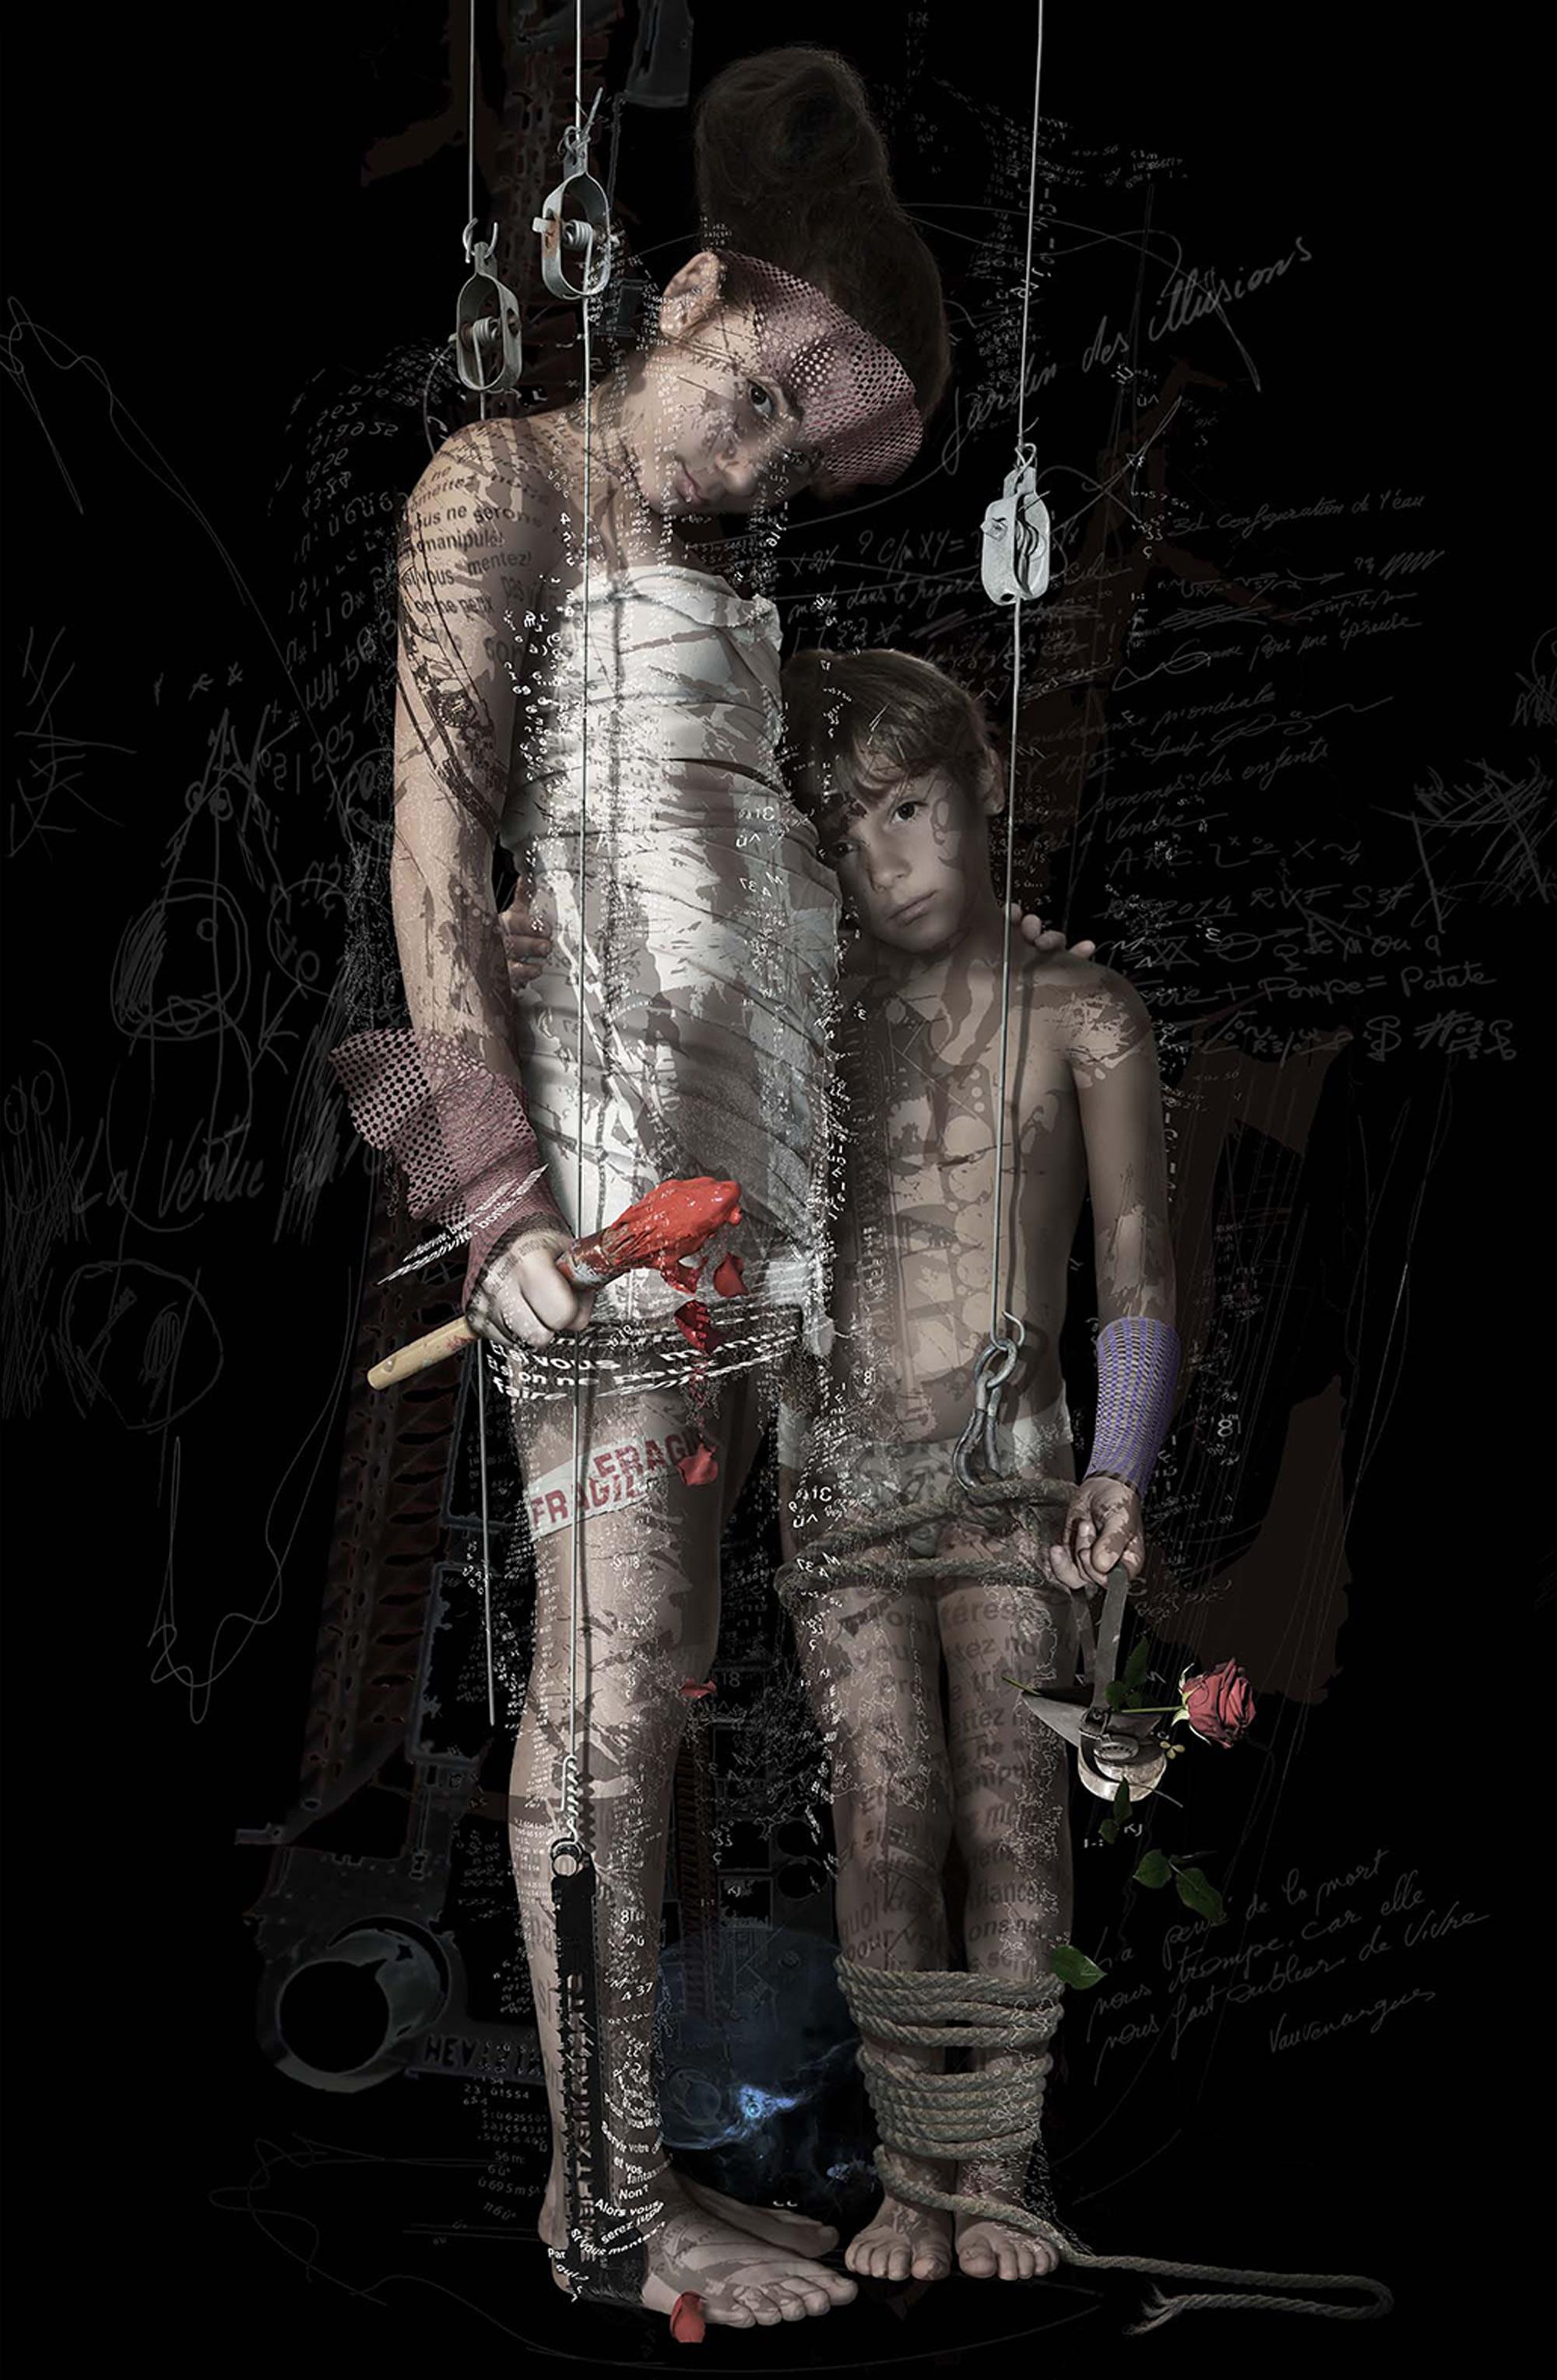 Fernand d'Onofrio - Le jardin des illusions